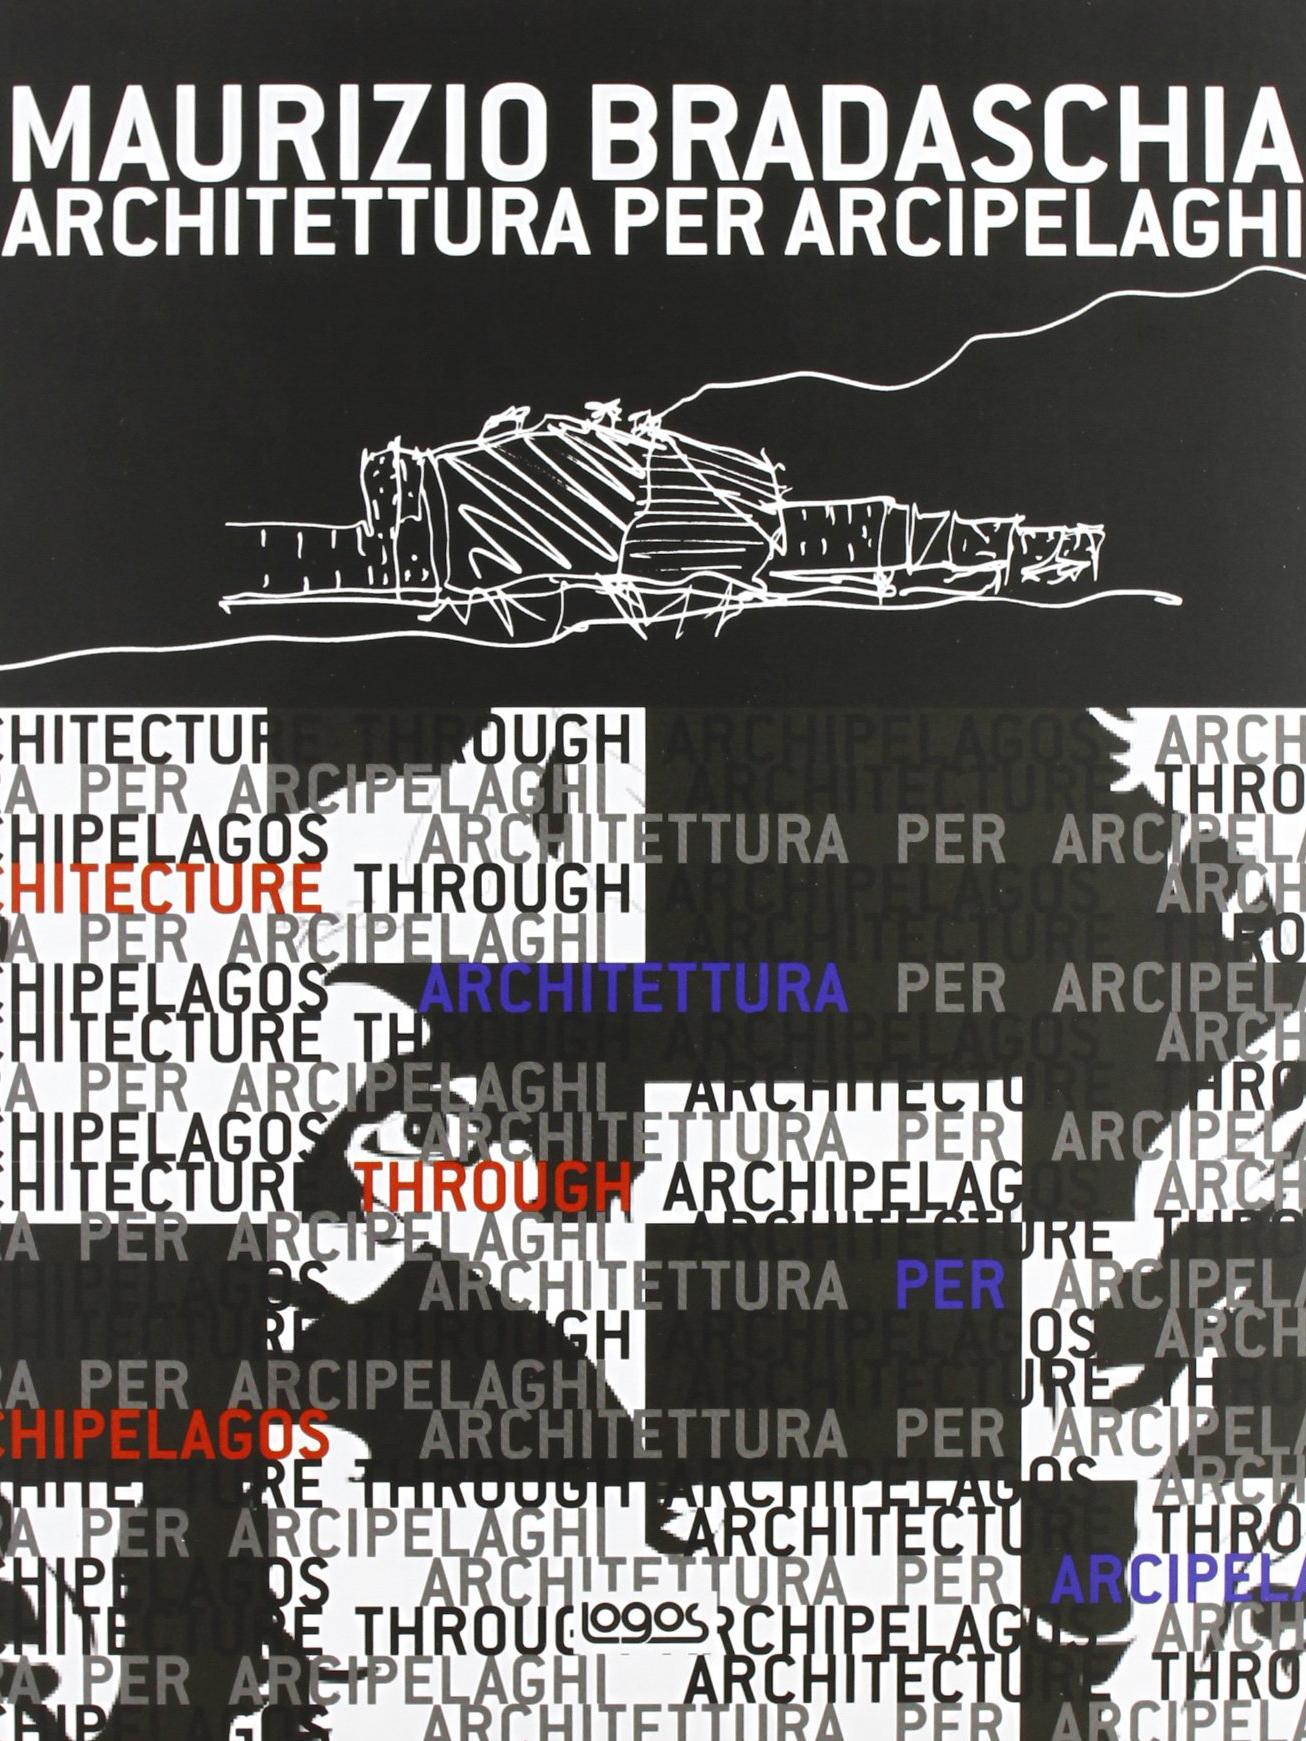 2011_2_architettura arcipelaghi